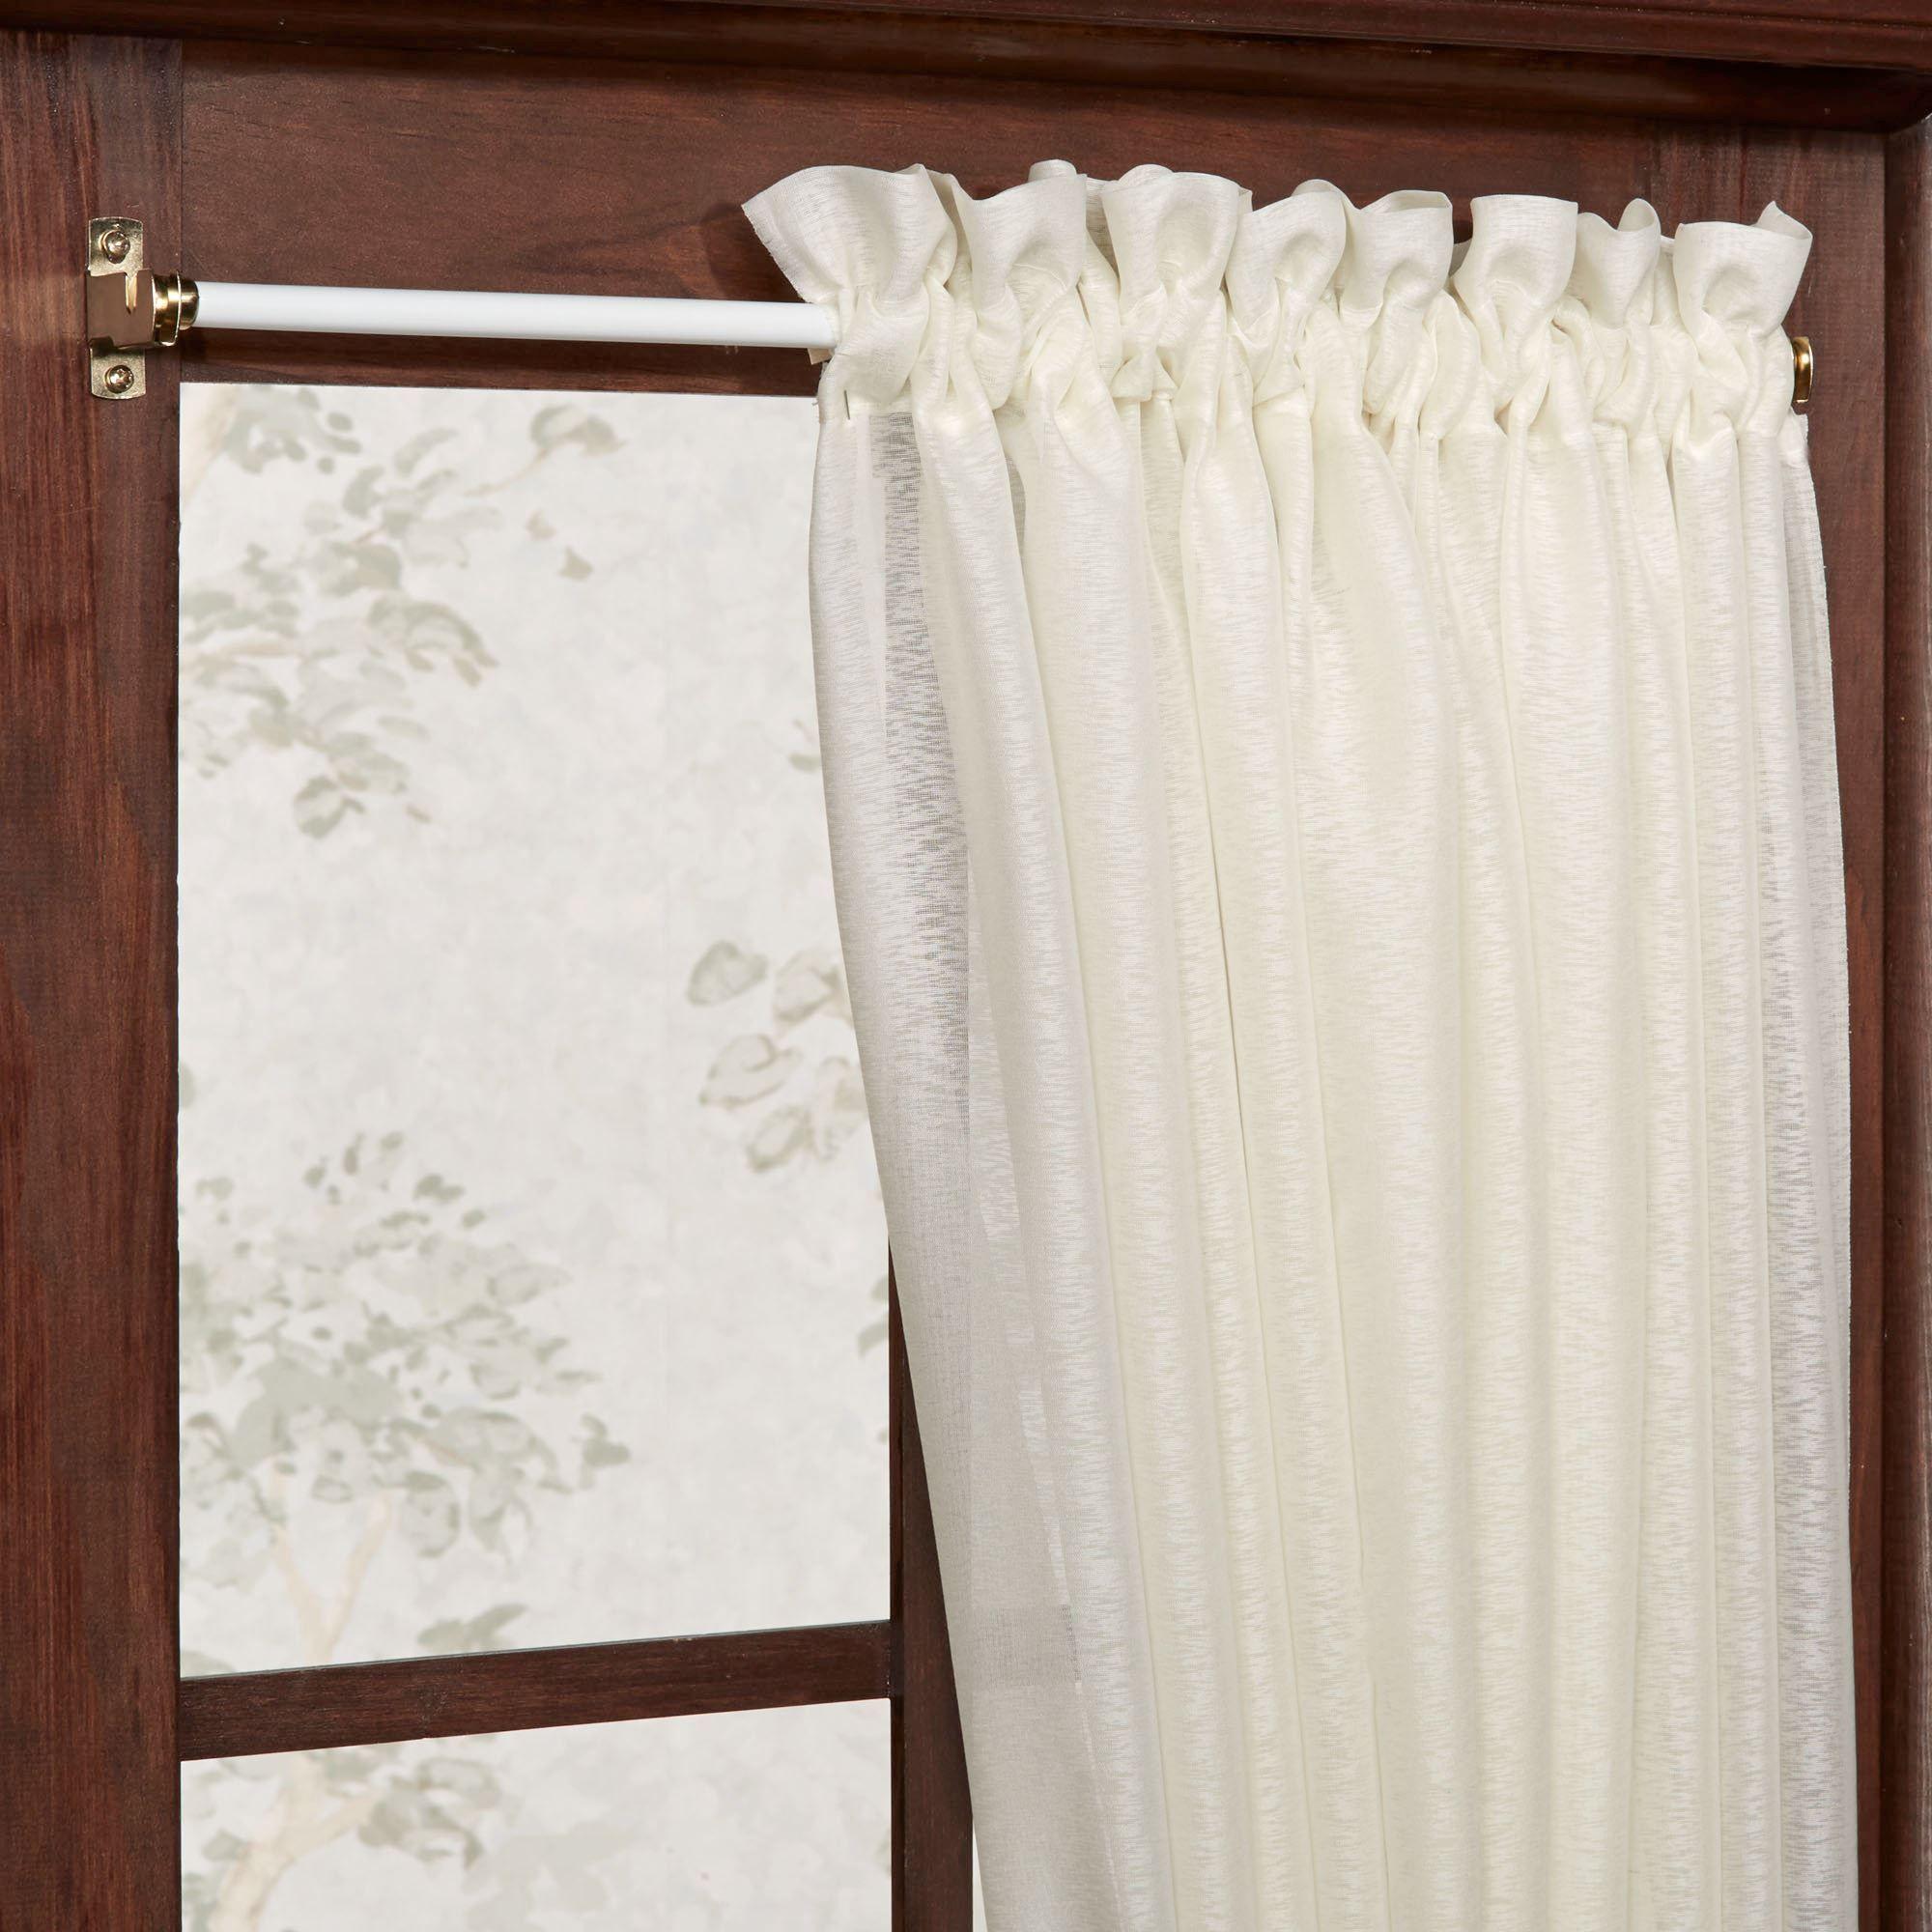 Expandable Wide Sash Curtain Rod Curtains Inside Window Frame